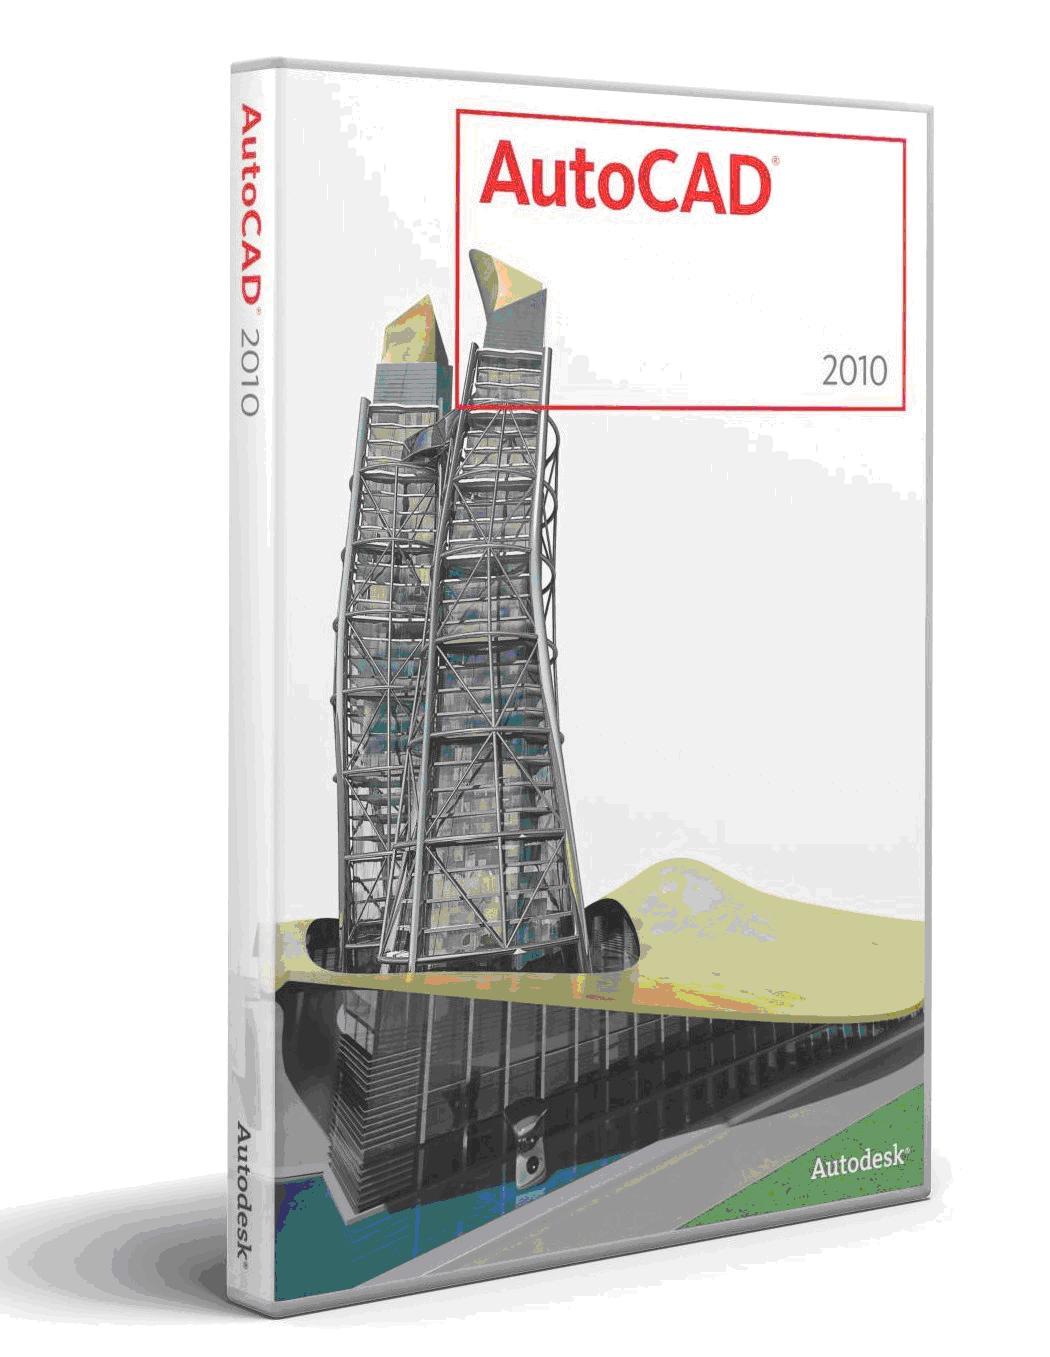 Crack Autodesk Autocad 2011 with Activator - http//free-stuff